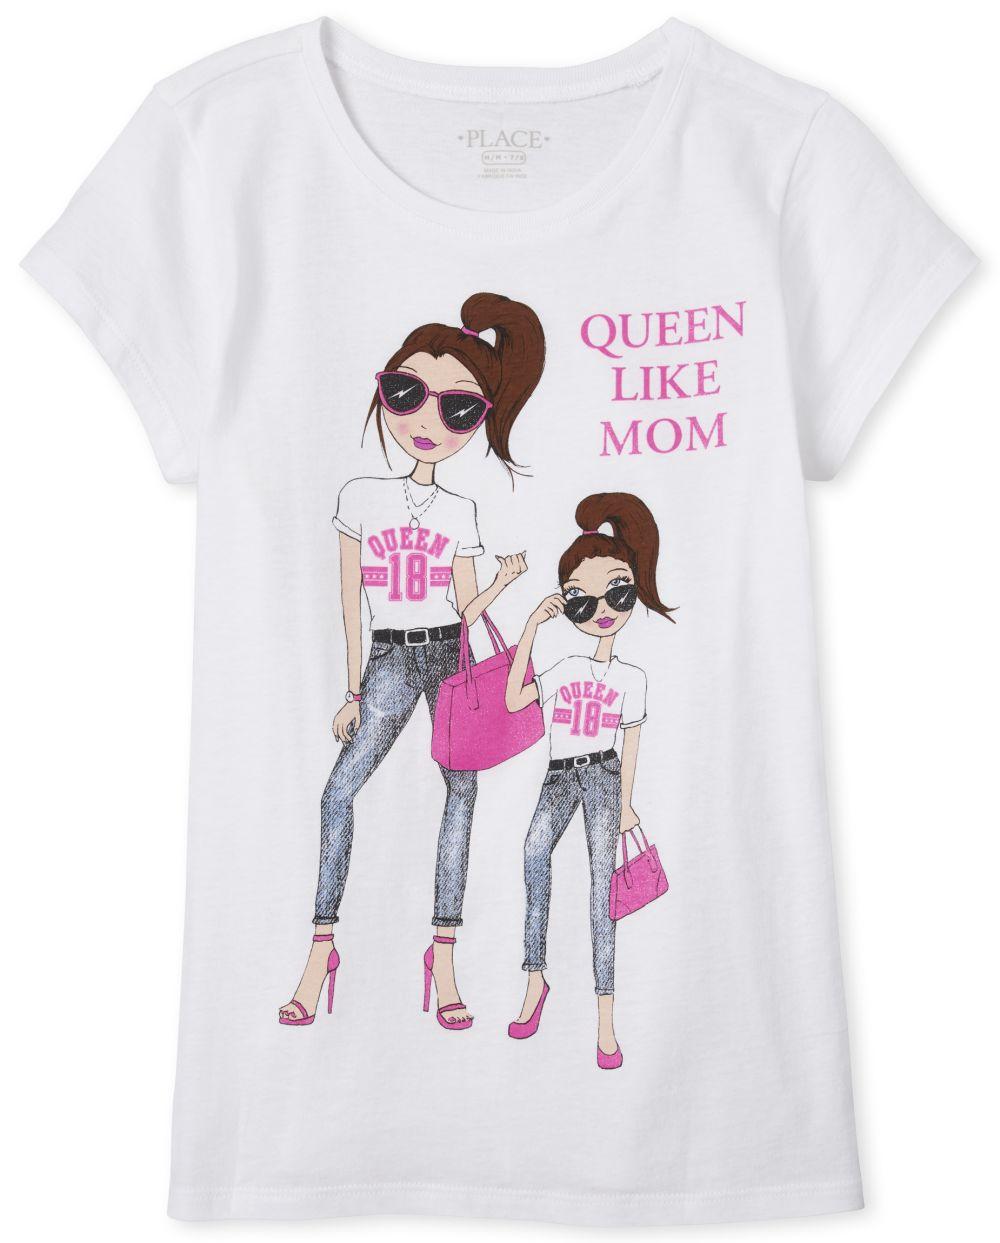 Girls Glitter Queen Like Mom Graphic Tee